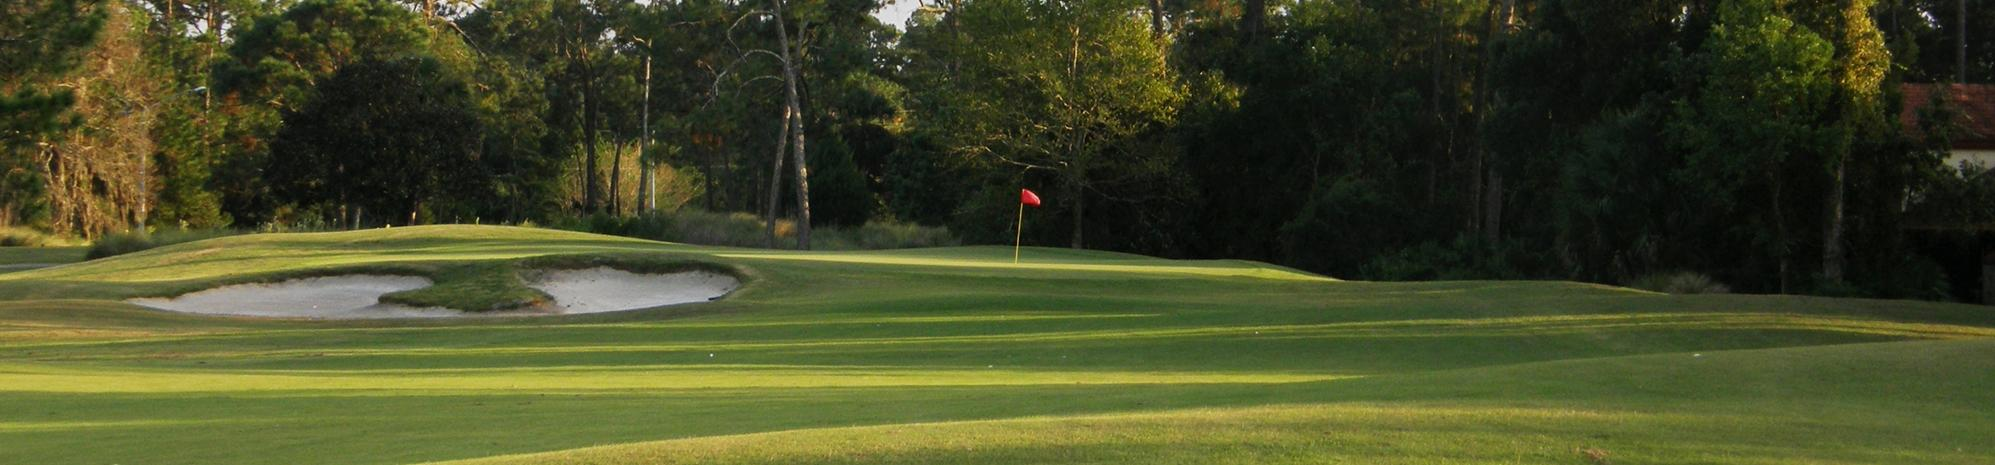 best dating jacksonville florida golf courses